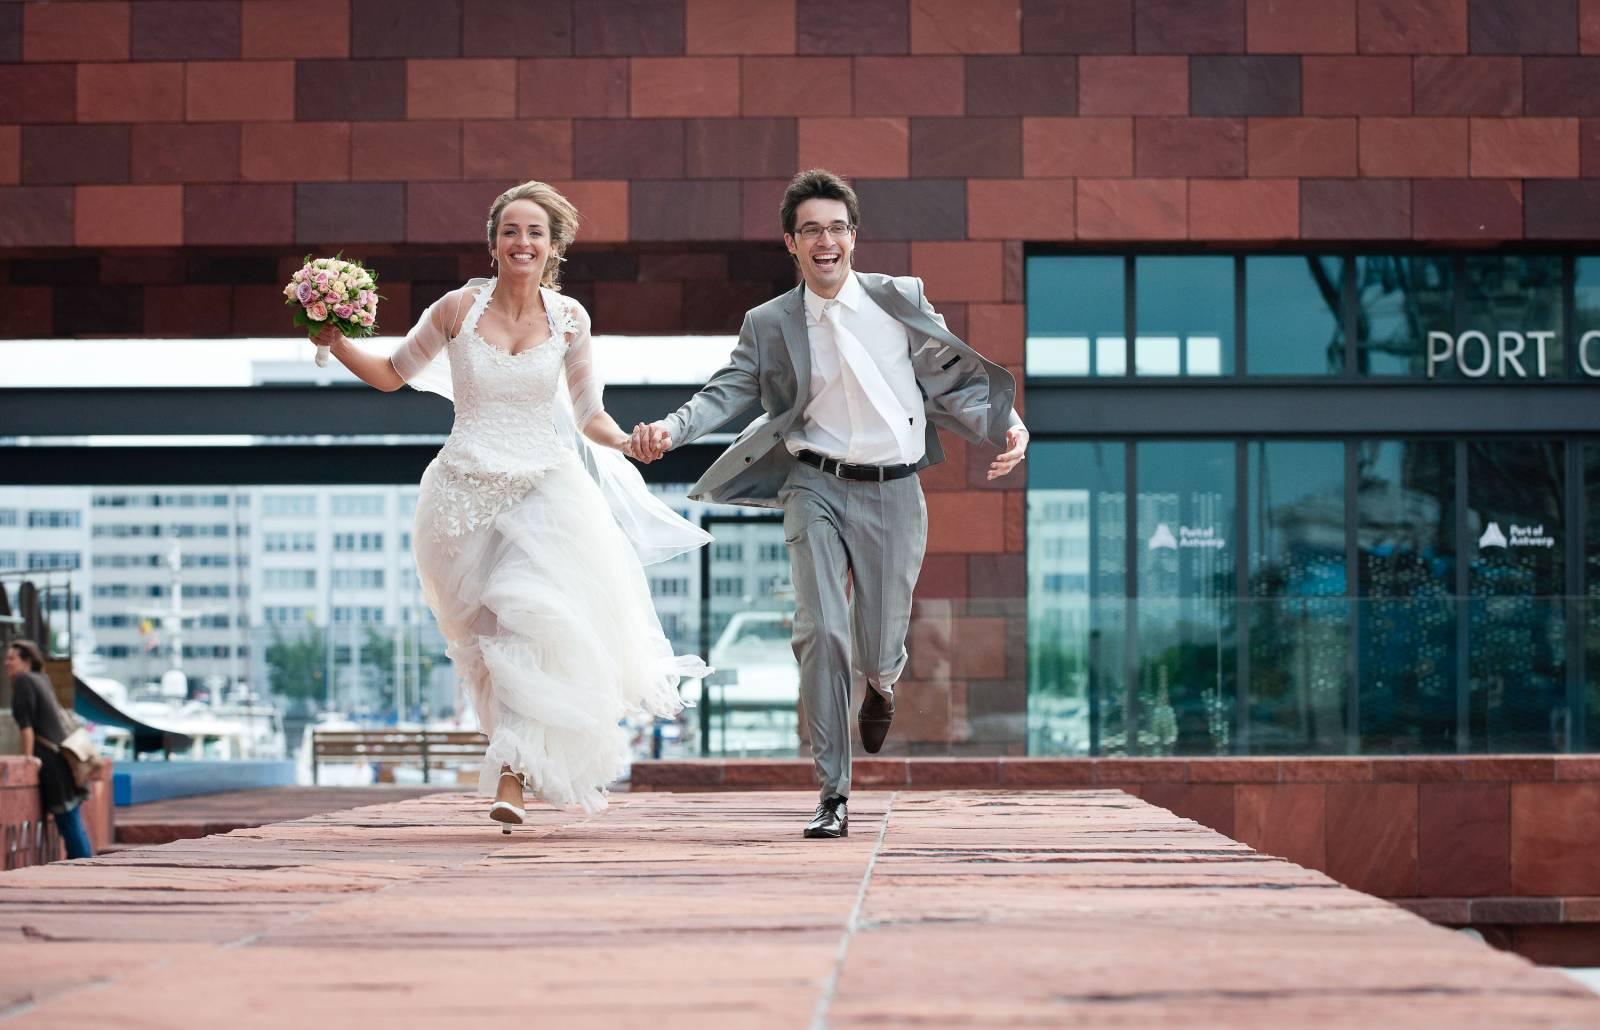 Foto Meeuw - House of Weddings - 4